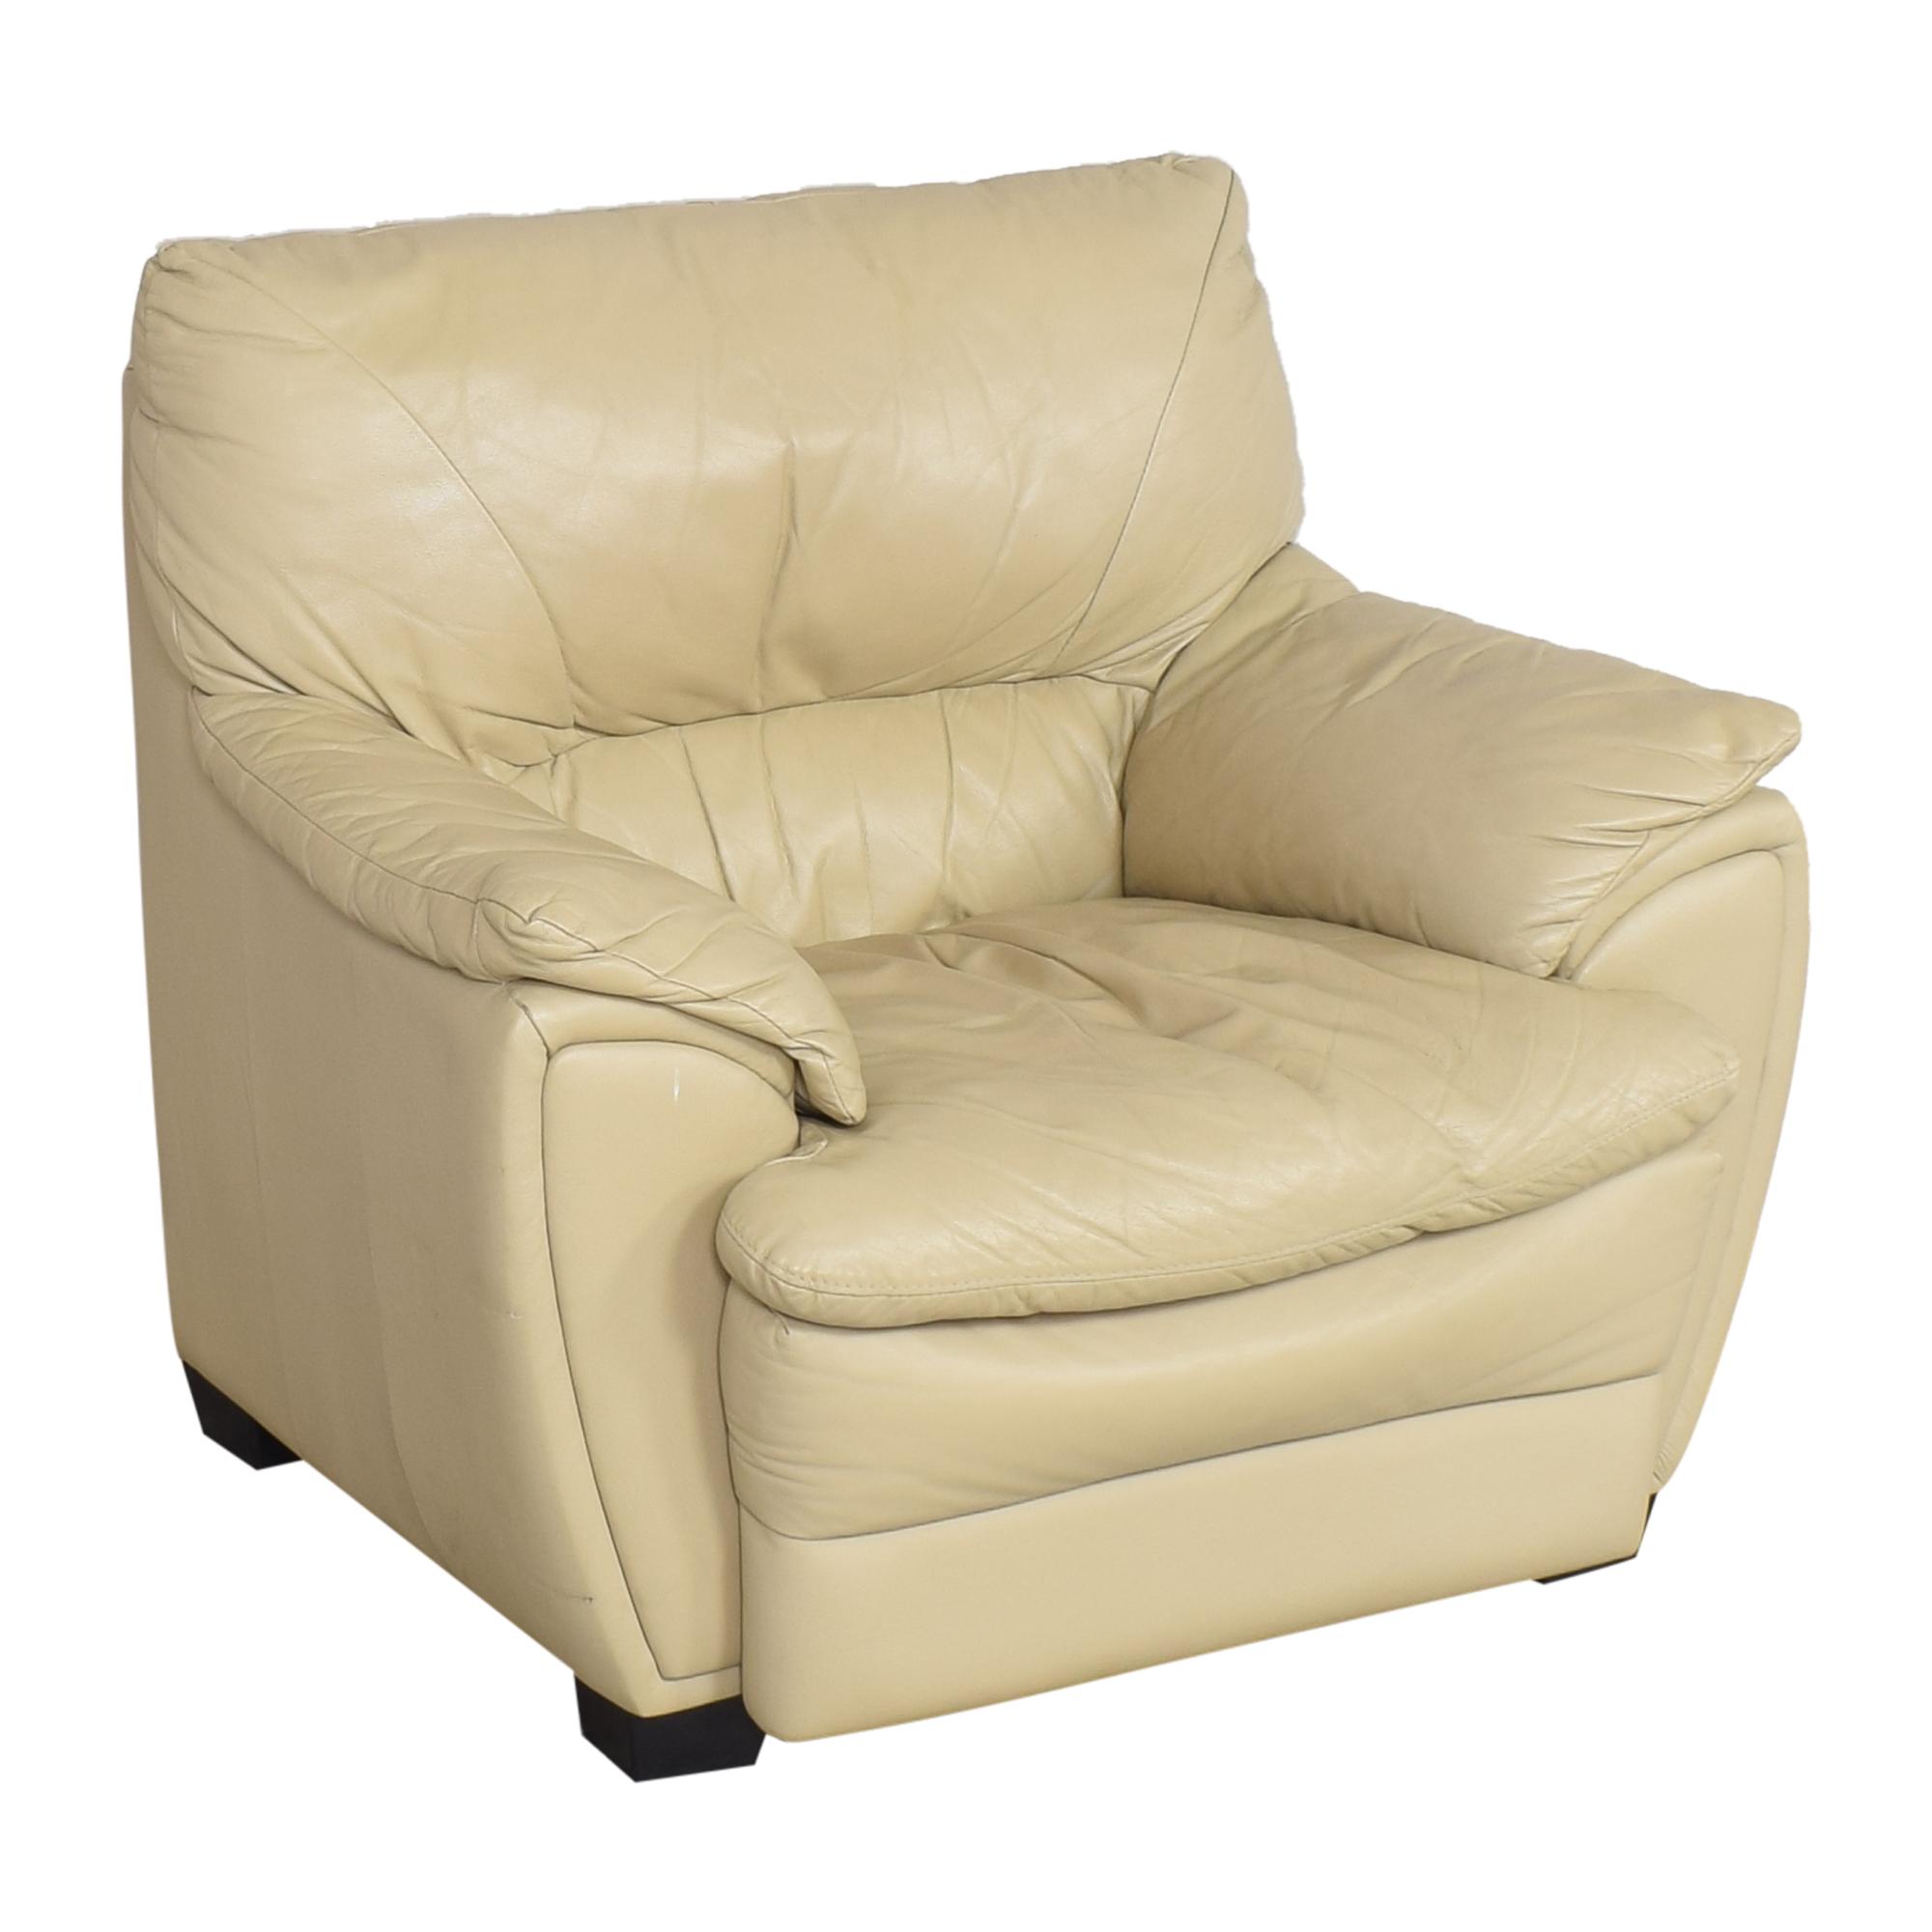 Raymour & Flanigan Raymour & Flanigan Padded Arm Chair